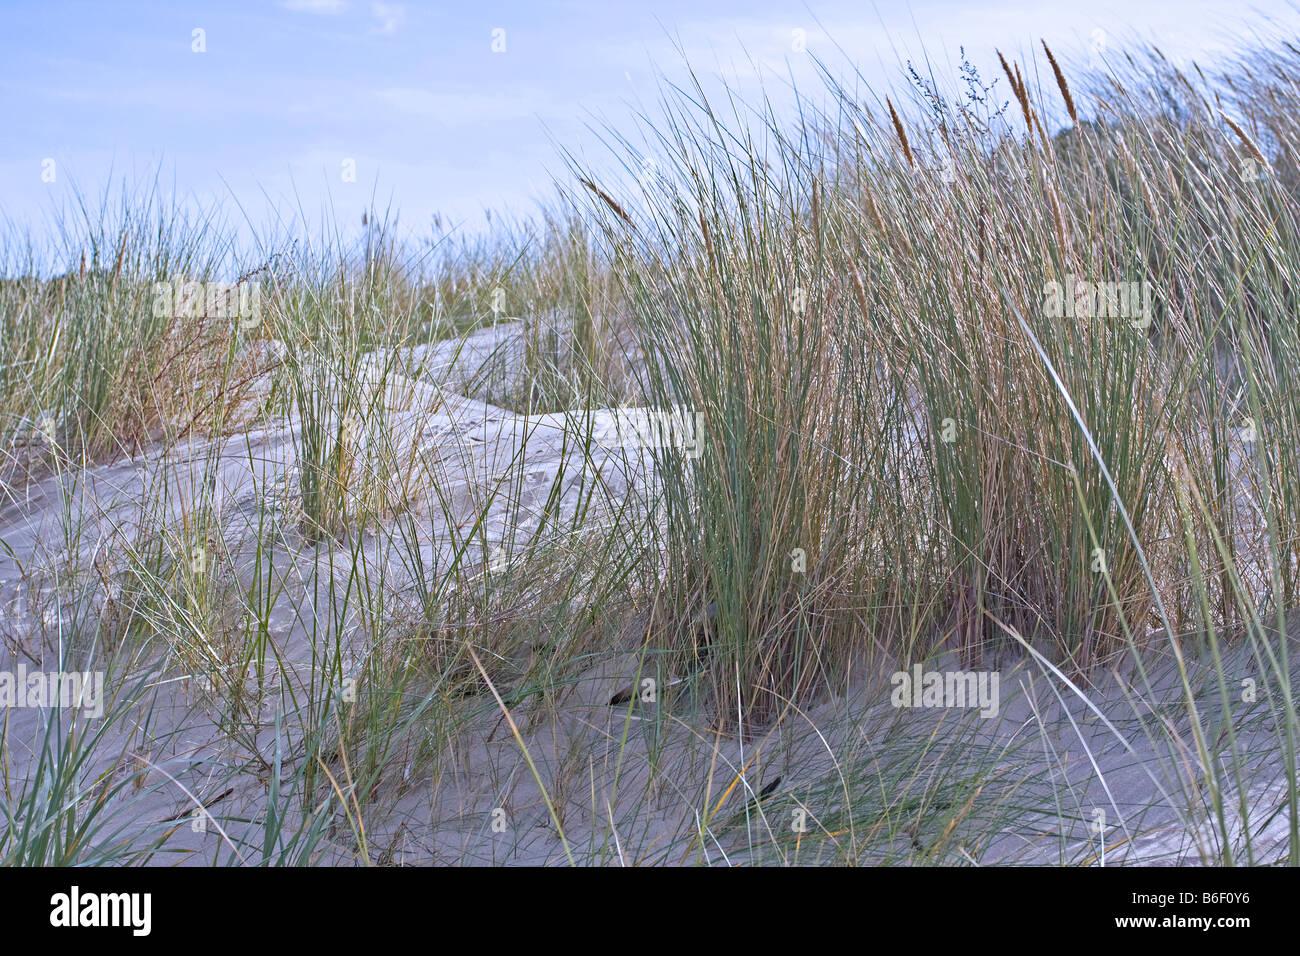 Marram by the sea, Usedom island, Mecklenburg-Western Pomerania, Germany, Europe - Stock Image